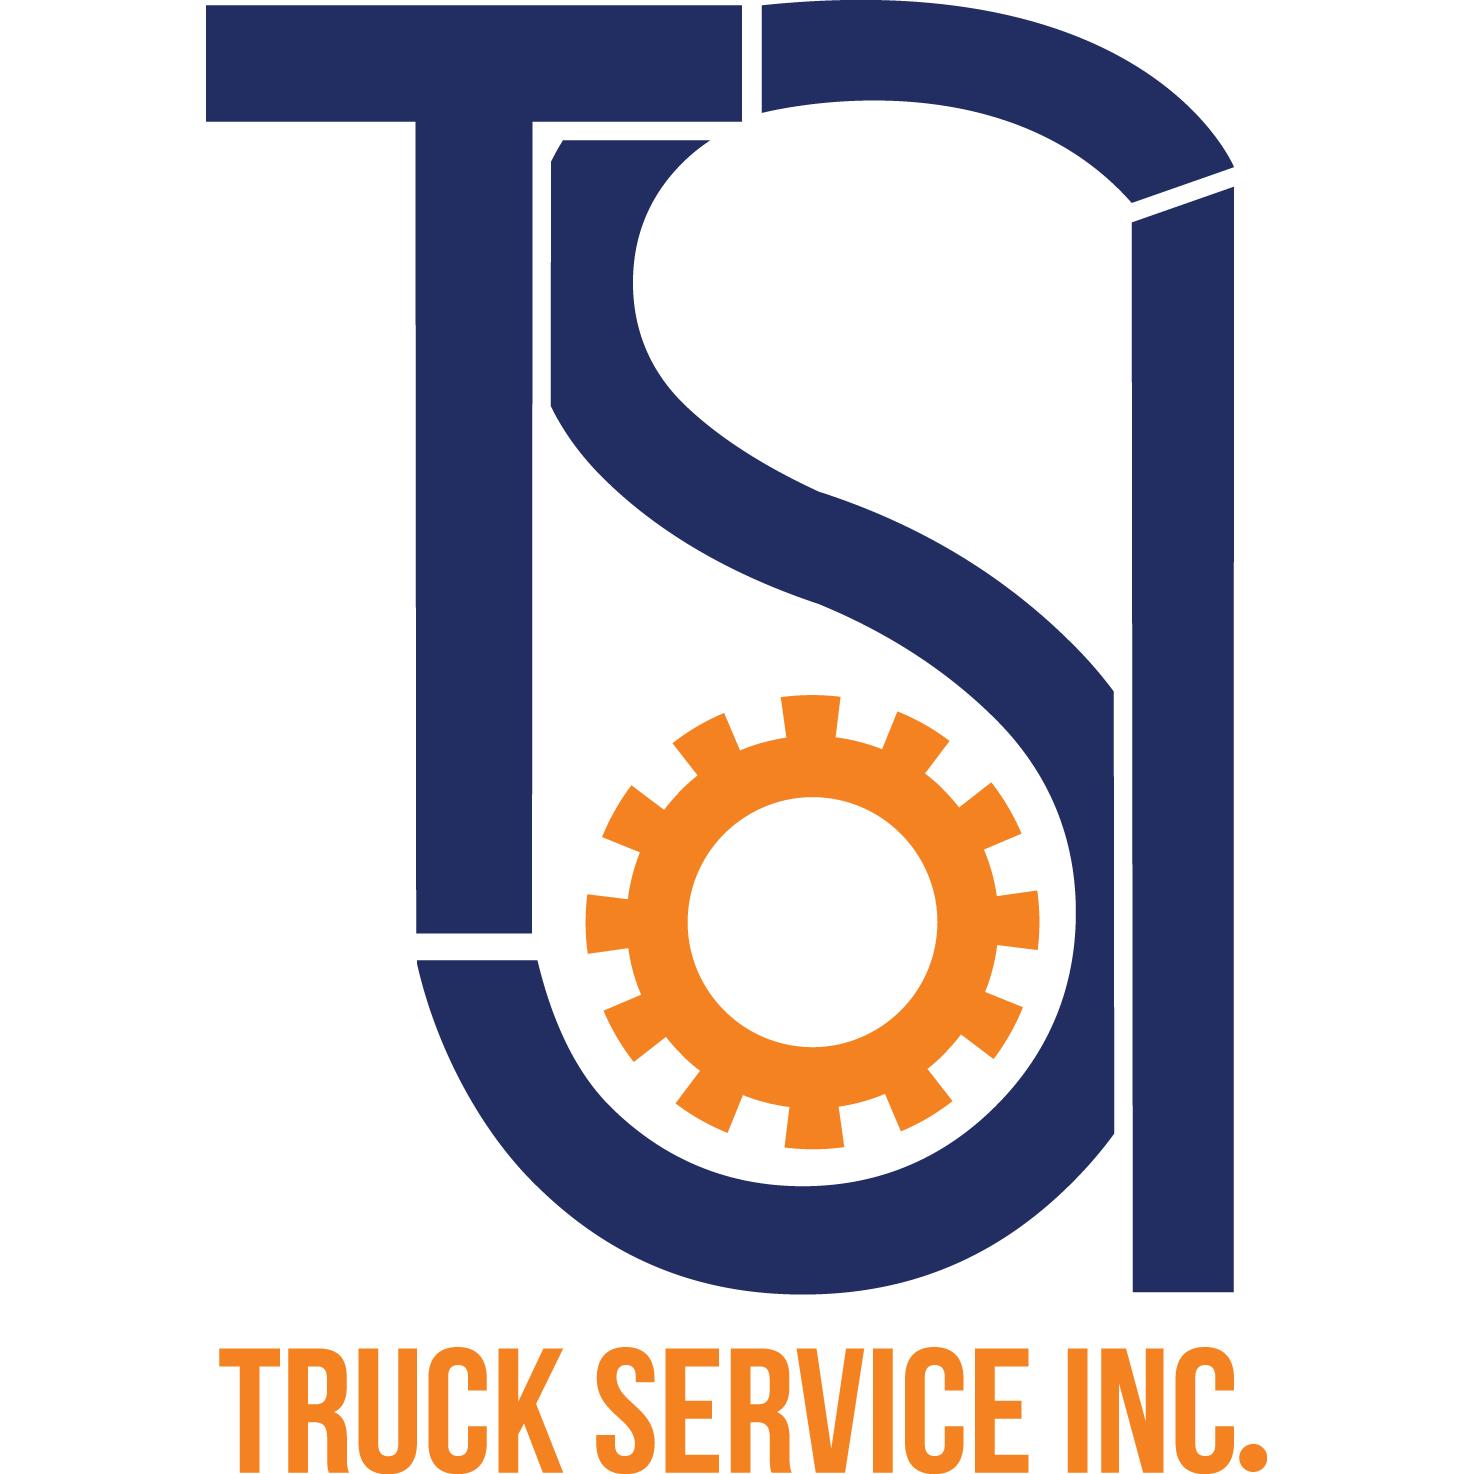 Truck Service Inc